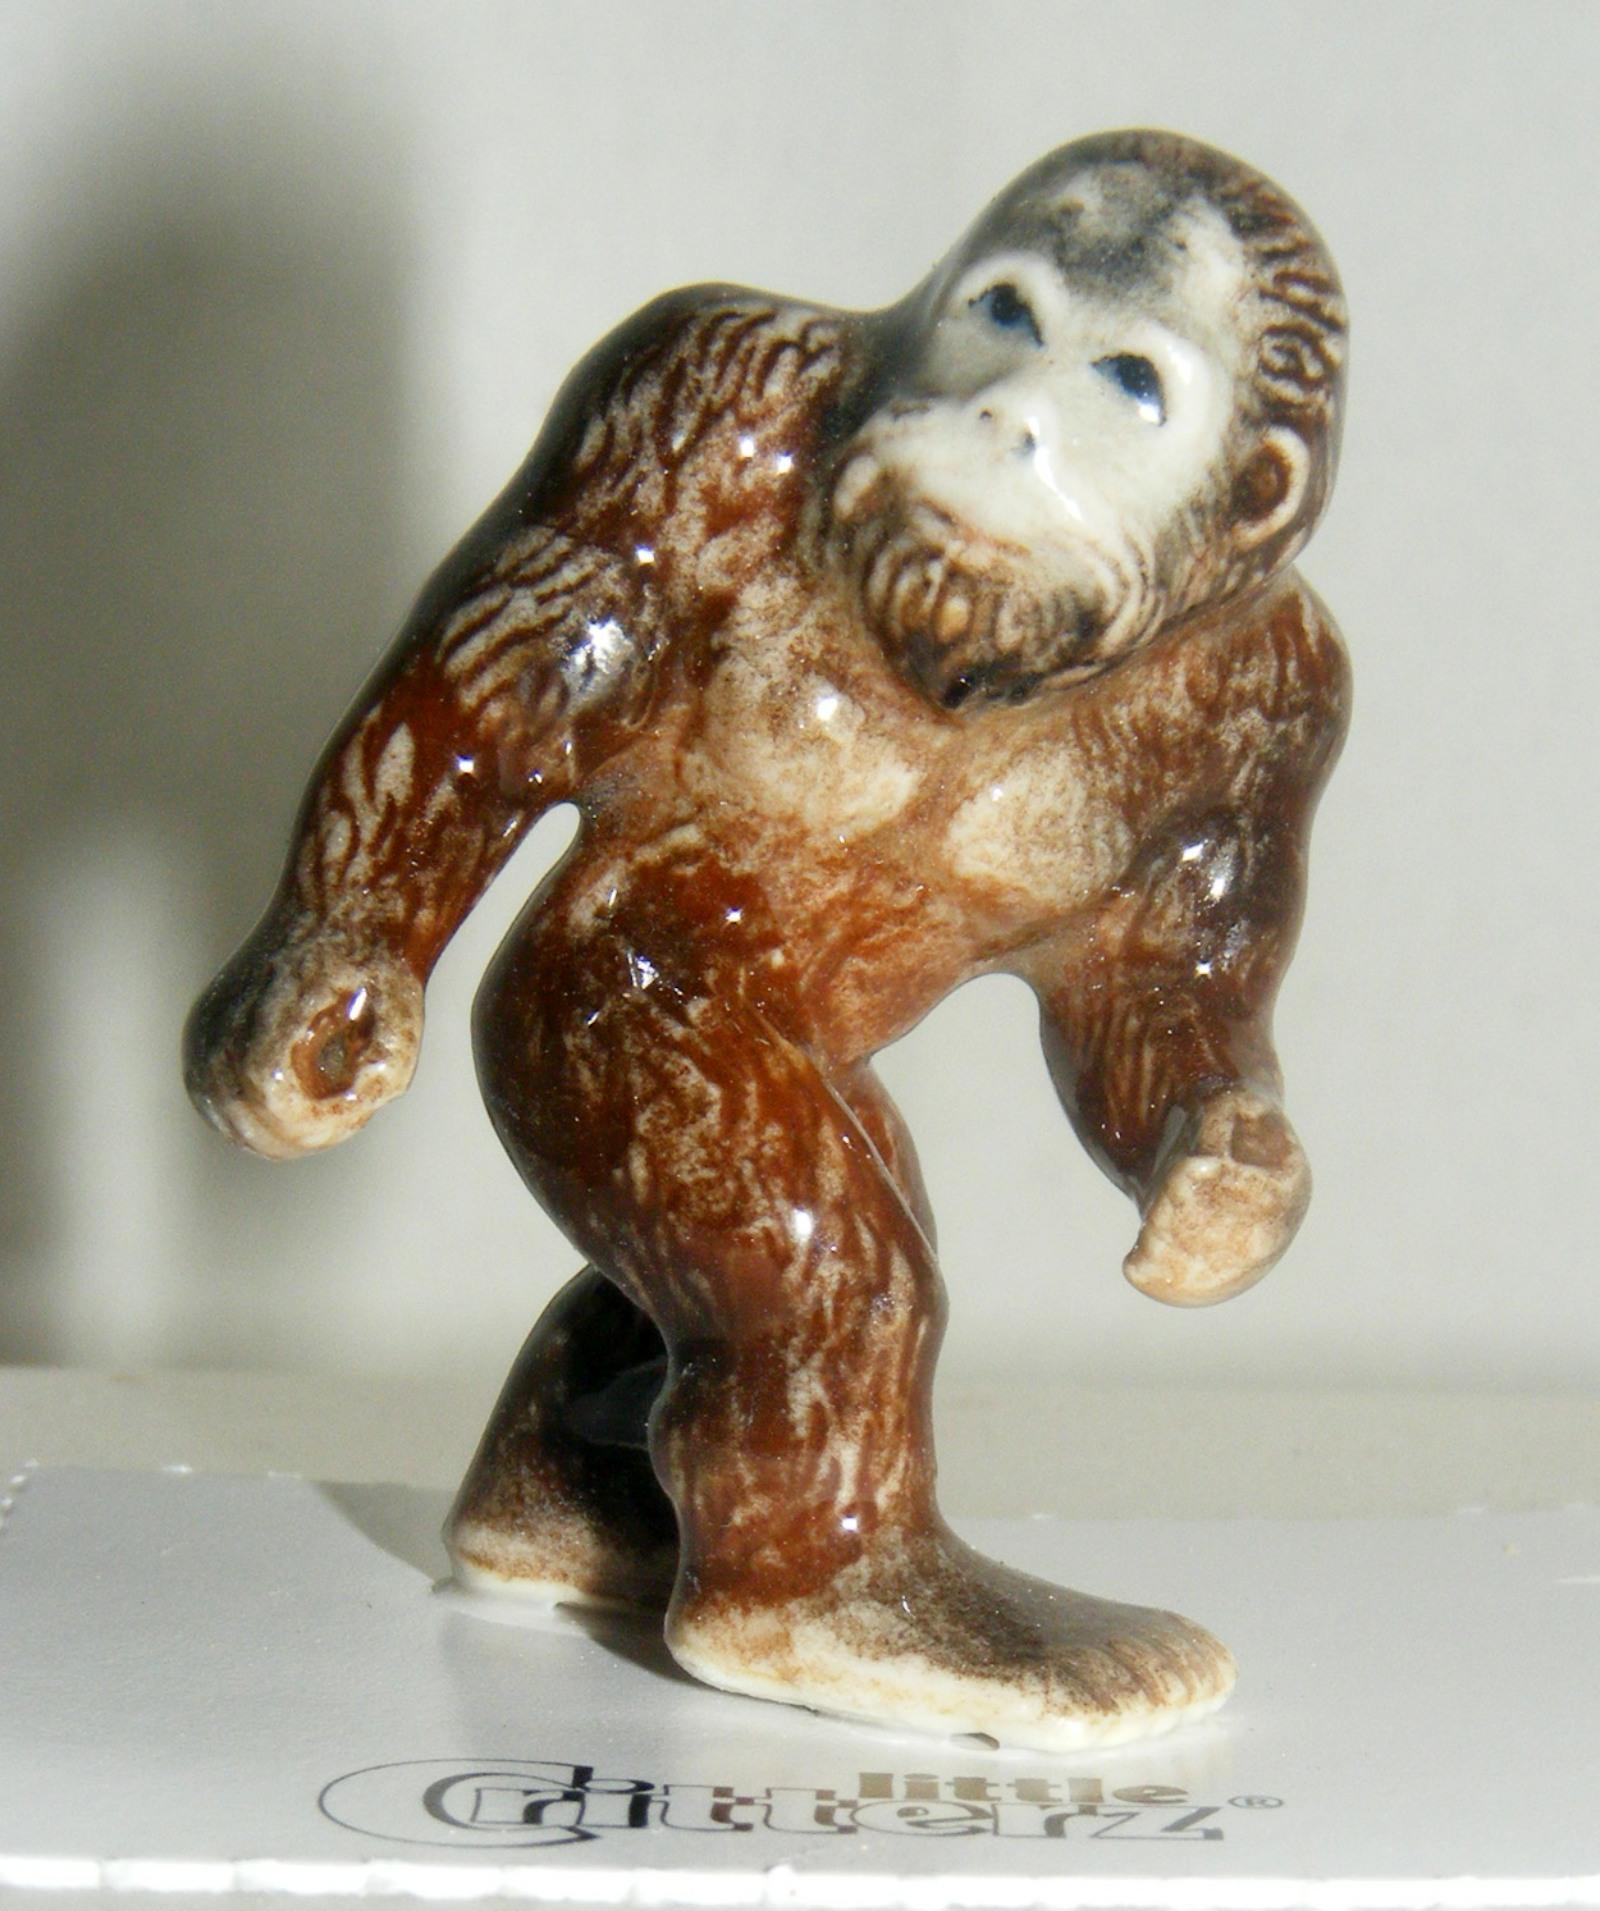 Little Critterz Miniature Porcelain Figure Sasquatch